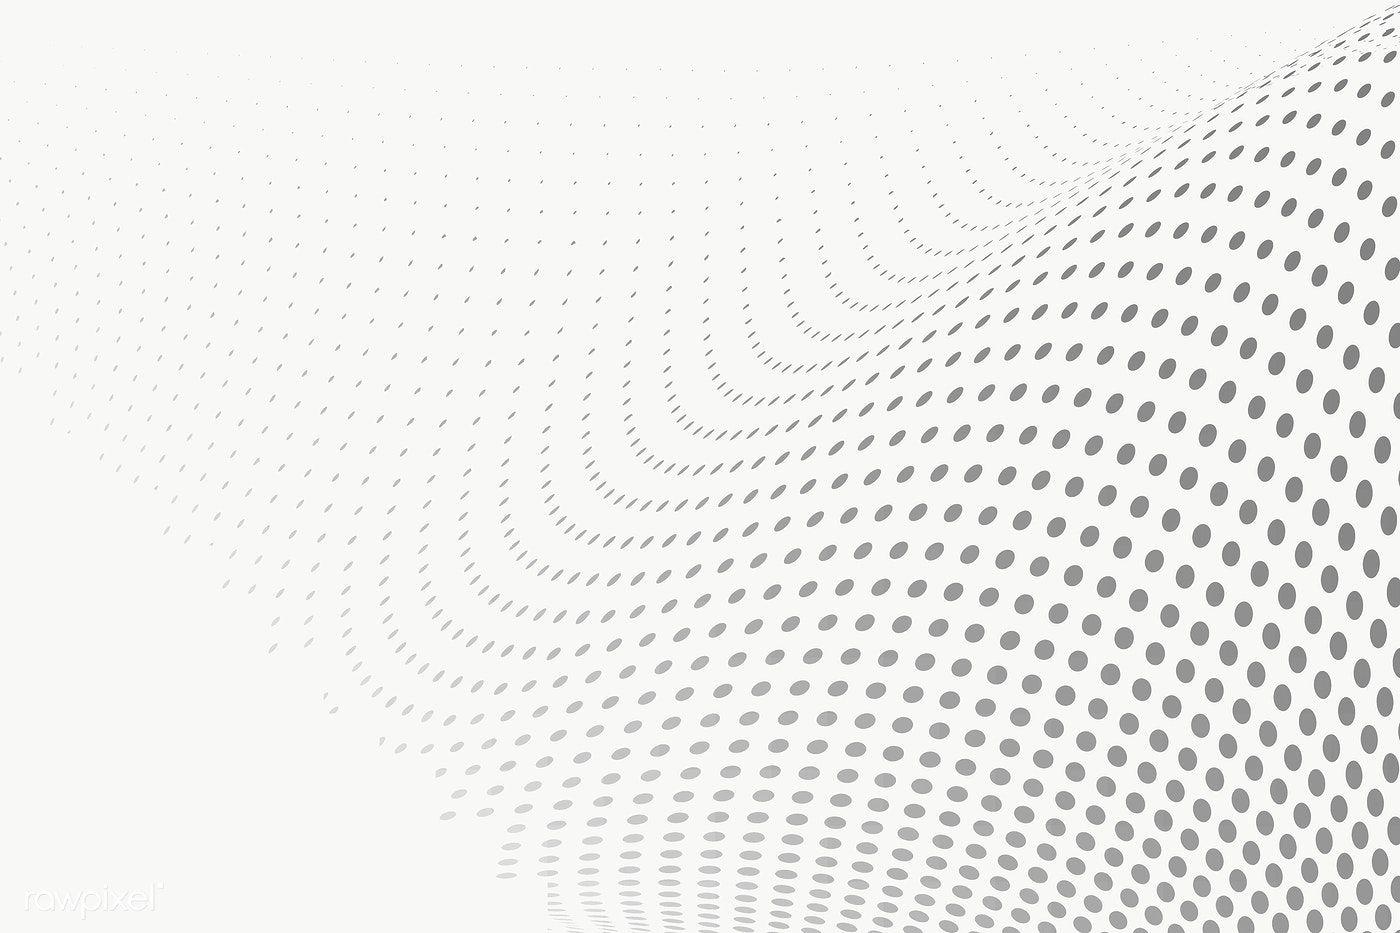 Download Premium Png Of Black Gradient Background Halftone Style 2337443 Gradient Background Halftone Background